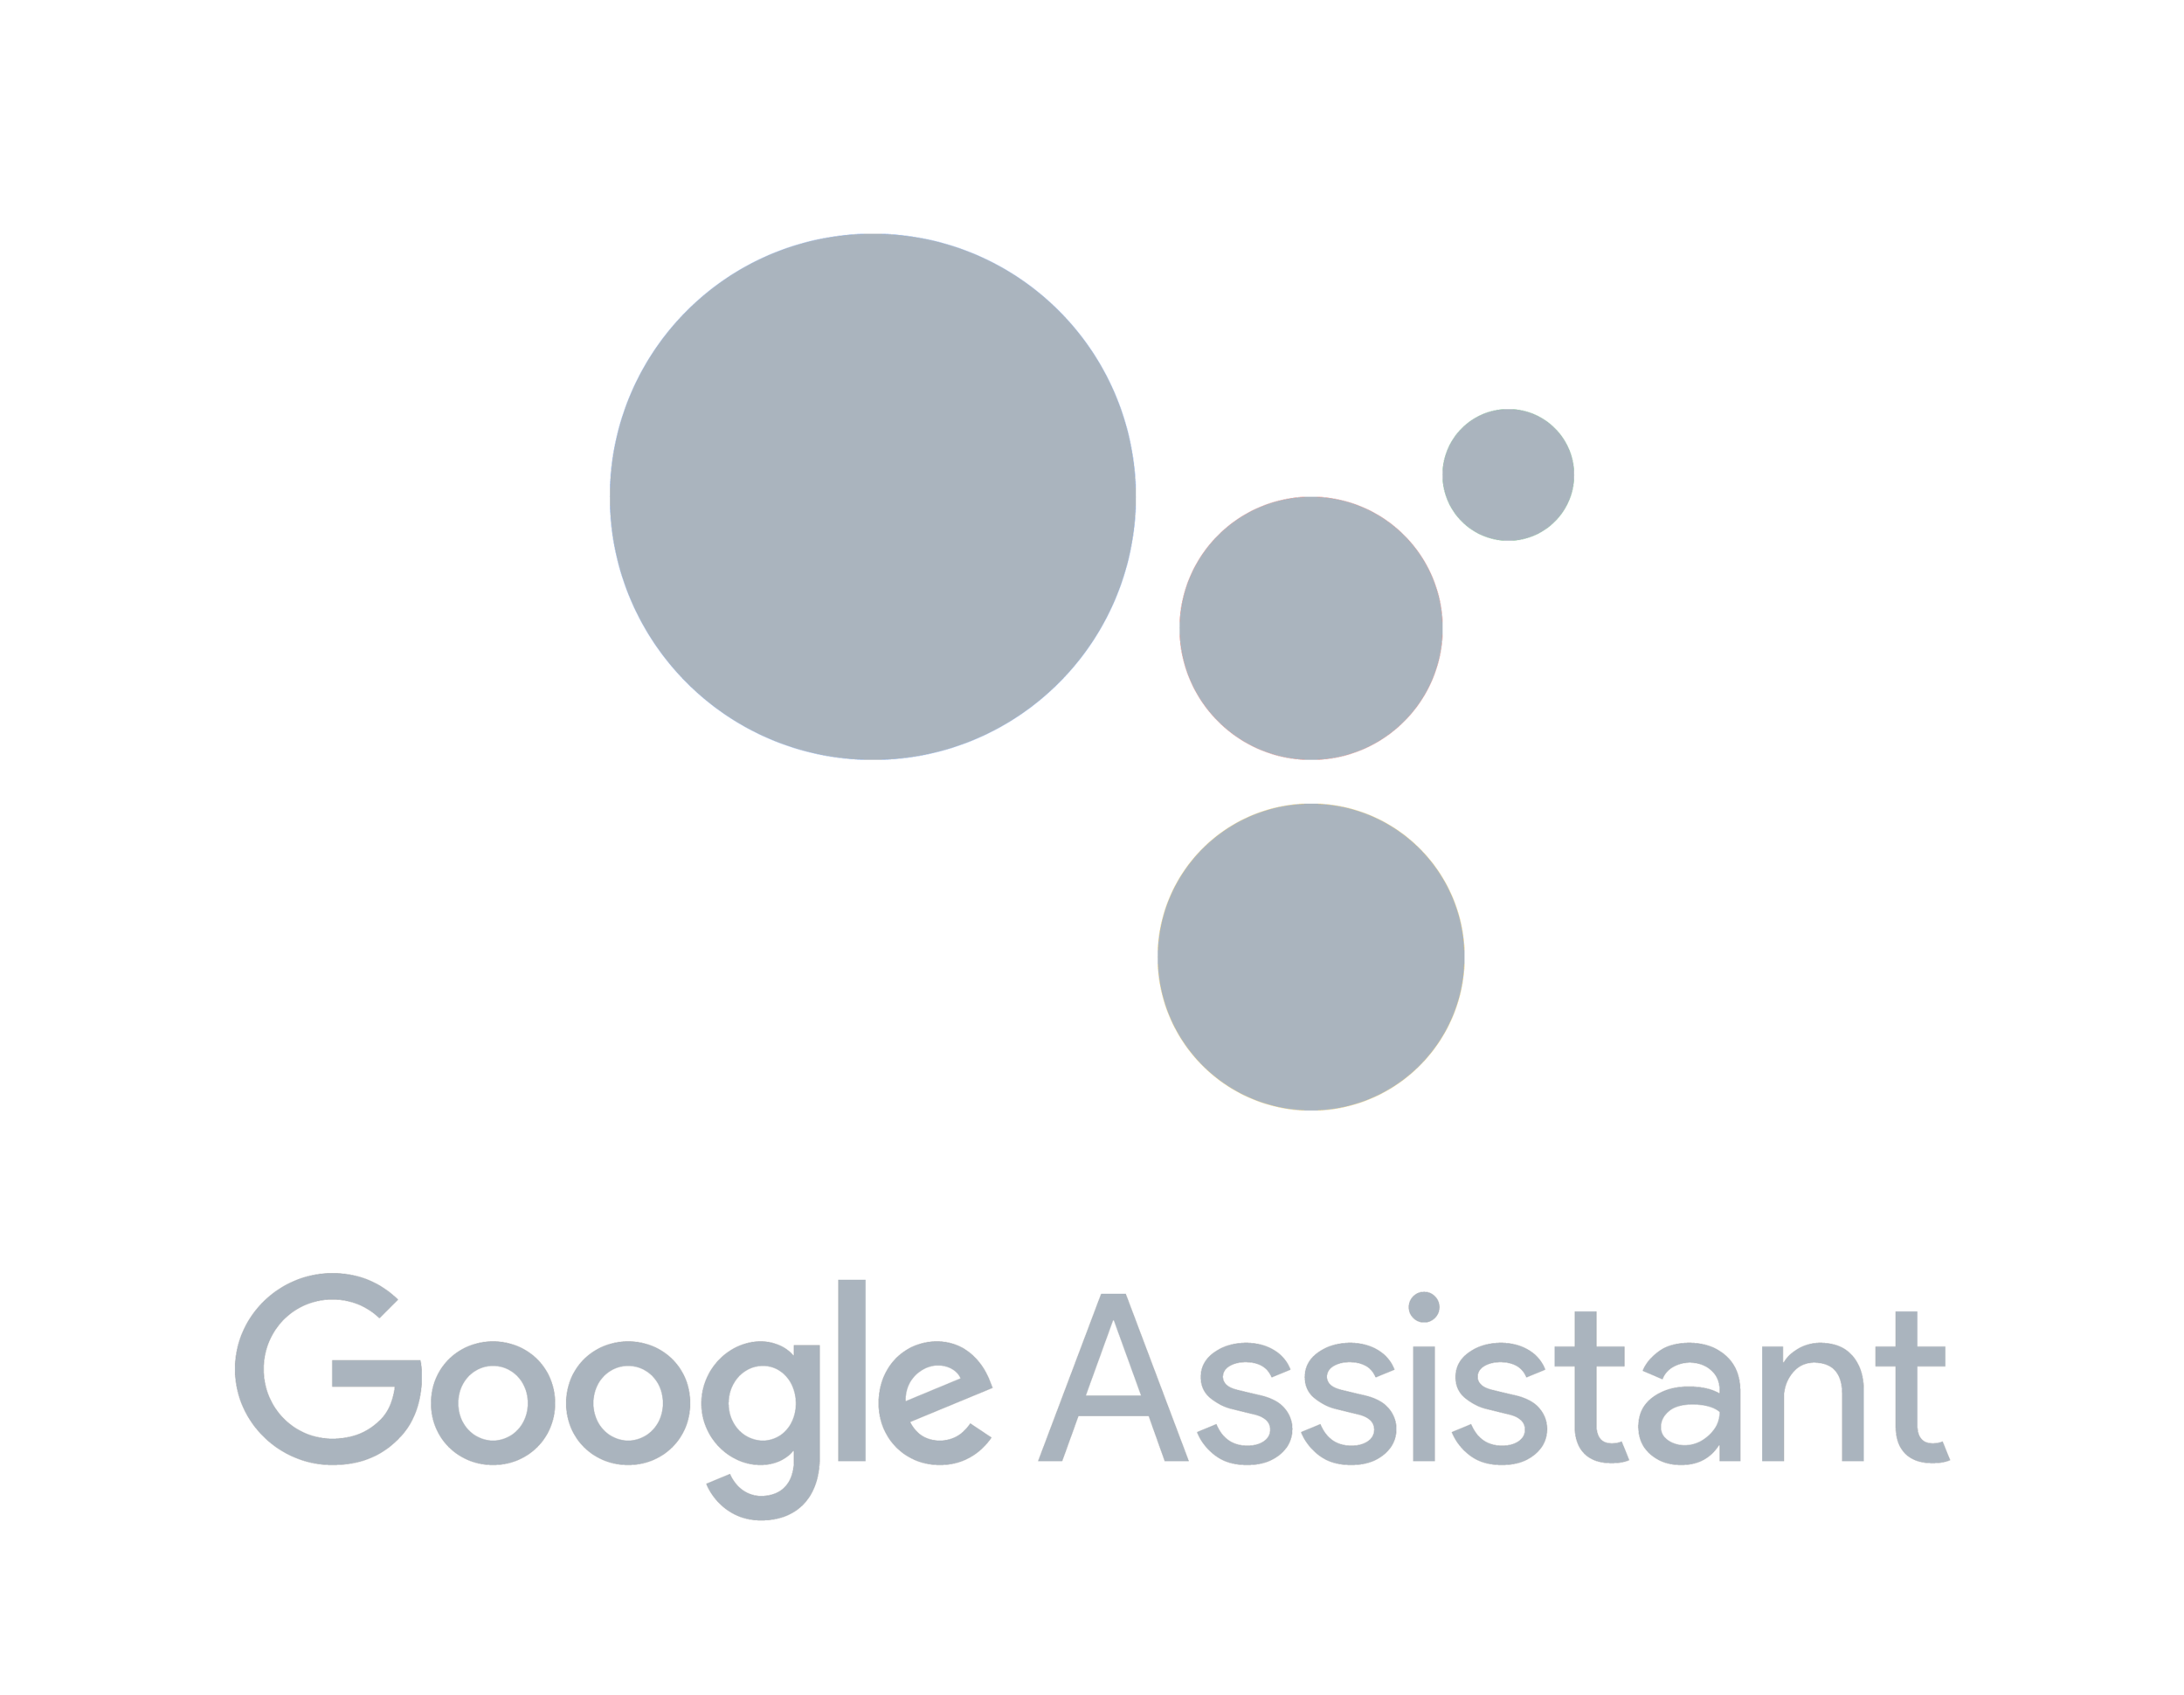 gogl_grey_logo.png